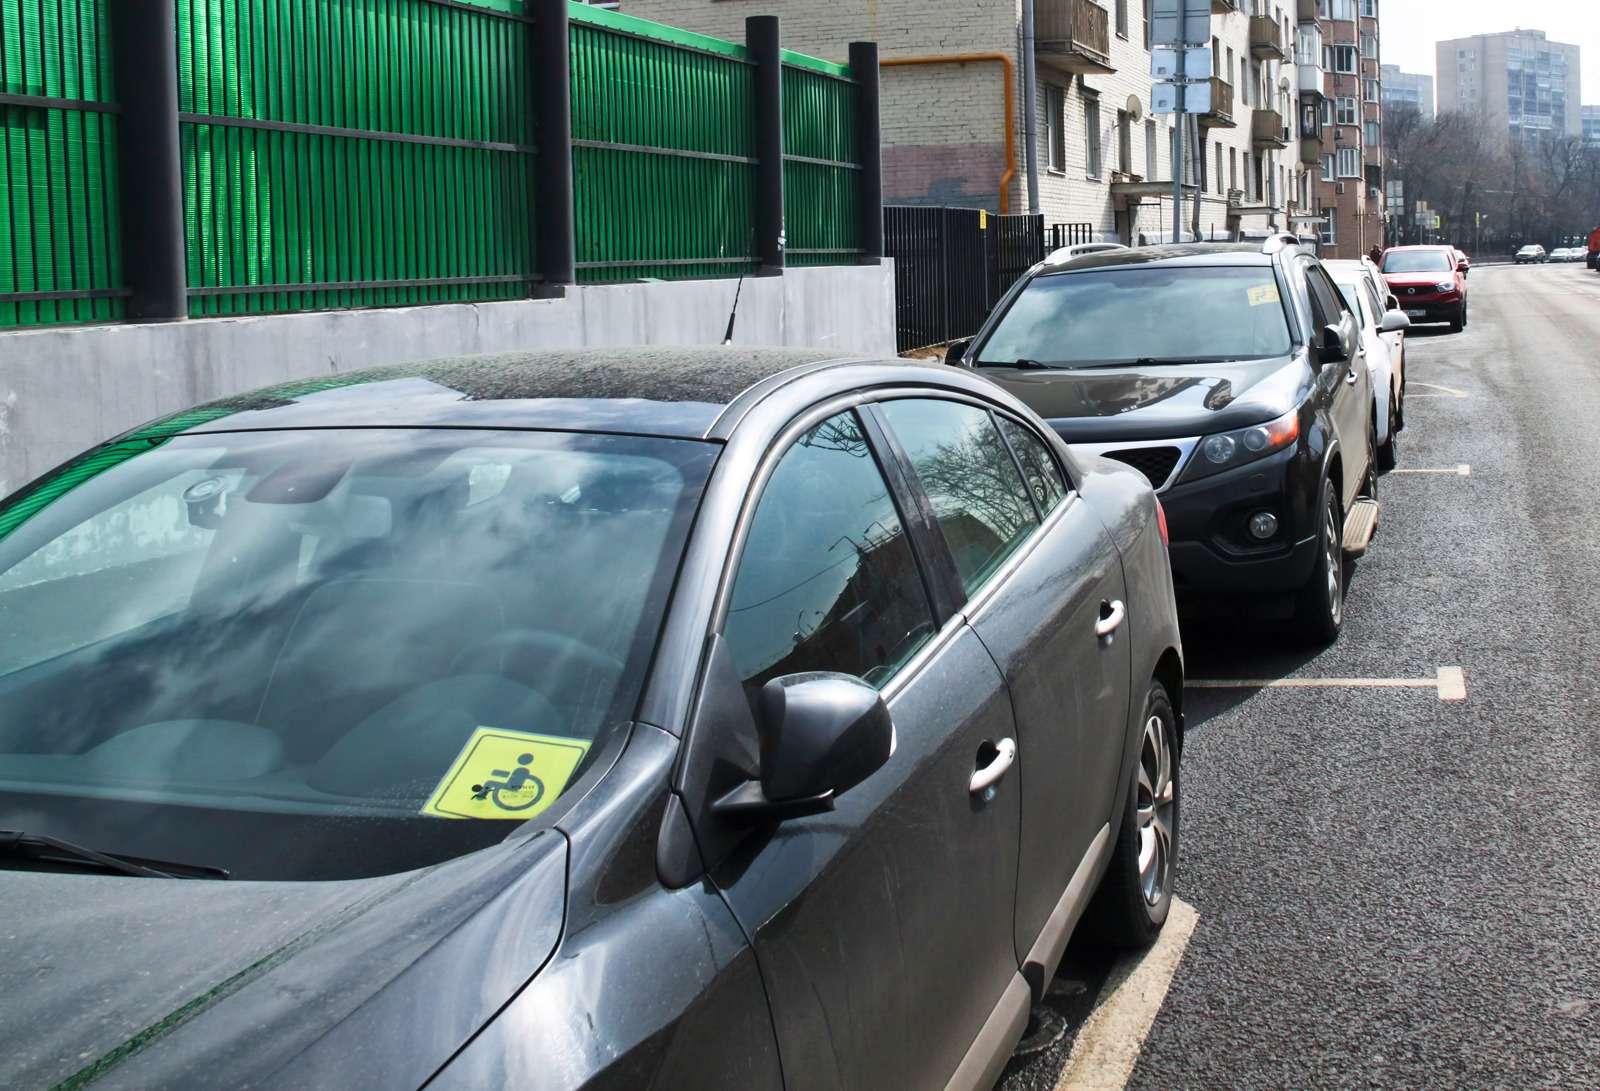 Парковка— дляинвалидов или длялжеинвалидов? Рейд ЗР— фото 585772